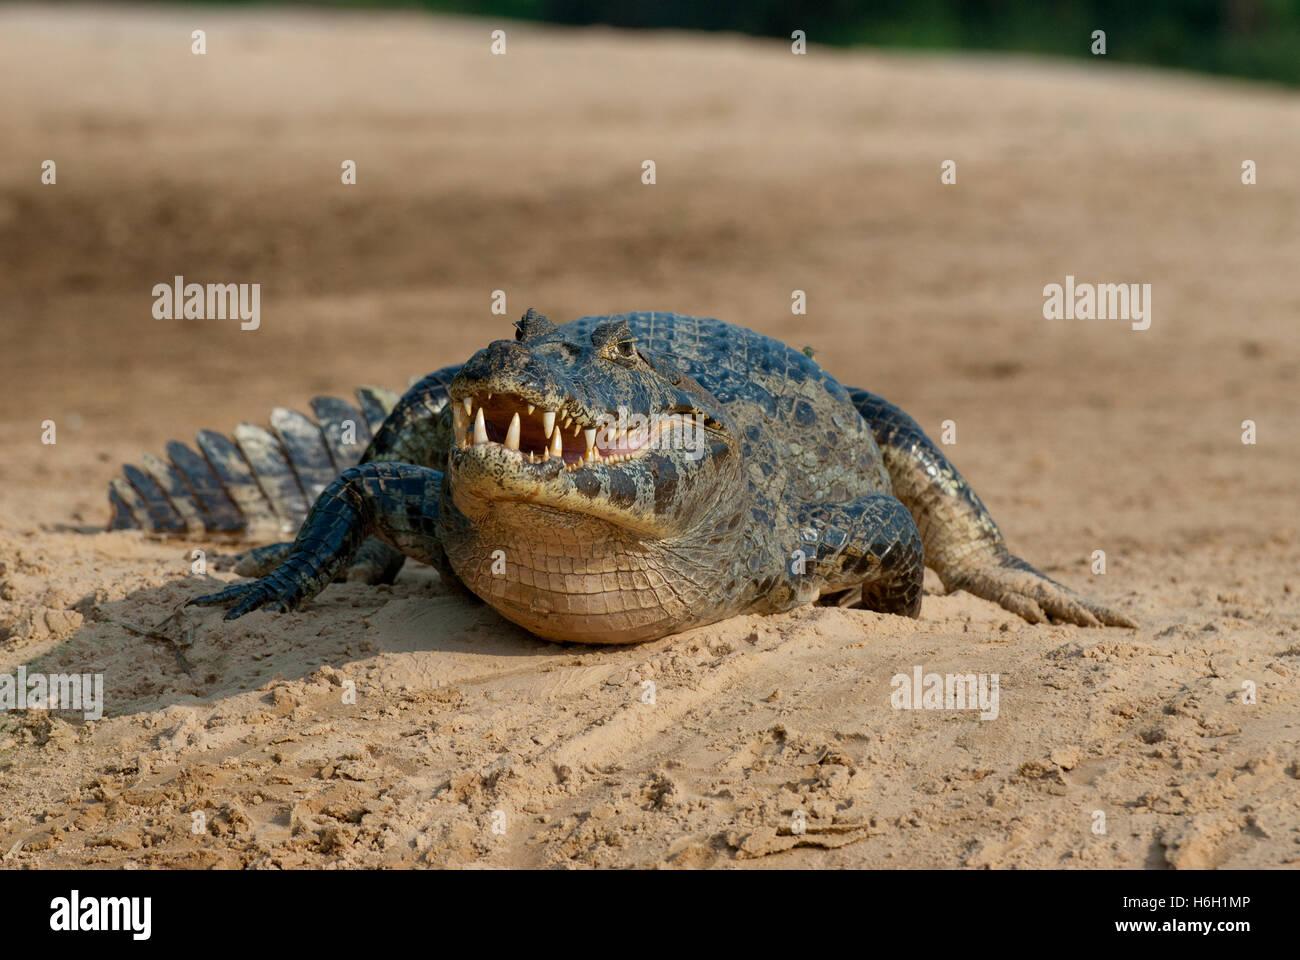 Yacare caiman (Caiman yacare) on a sandbar in the Pantanal, Brazil - Stock Image